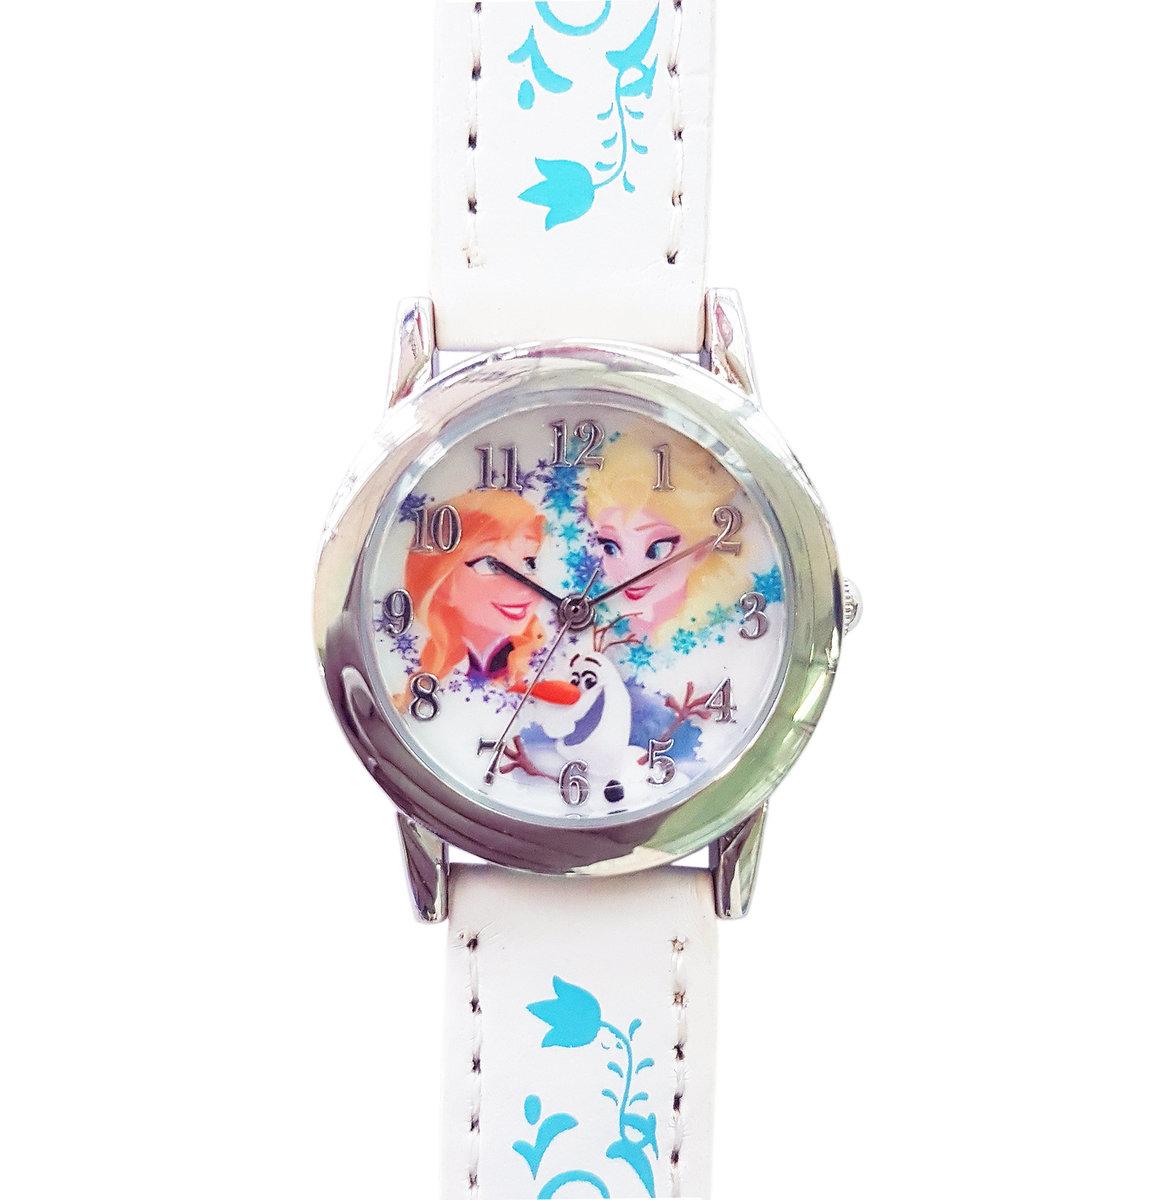 DISNEY FROZEN - Kids wrist watch - White color (Licensed by Disney)